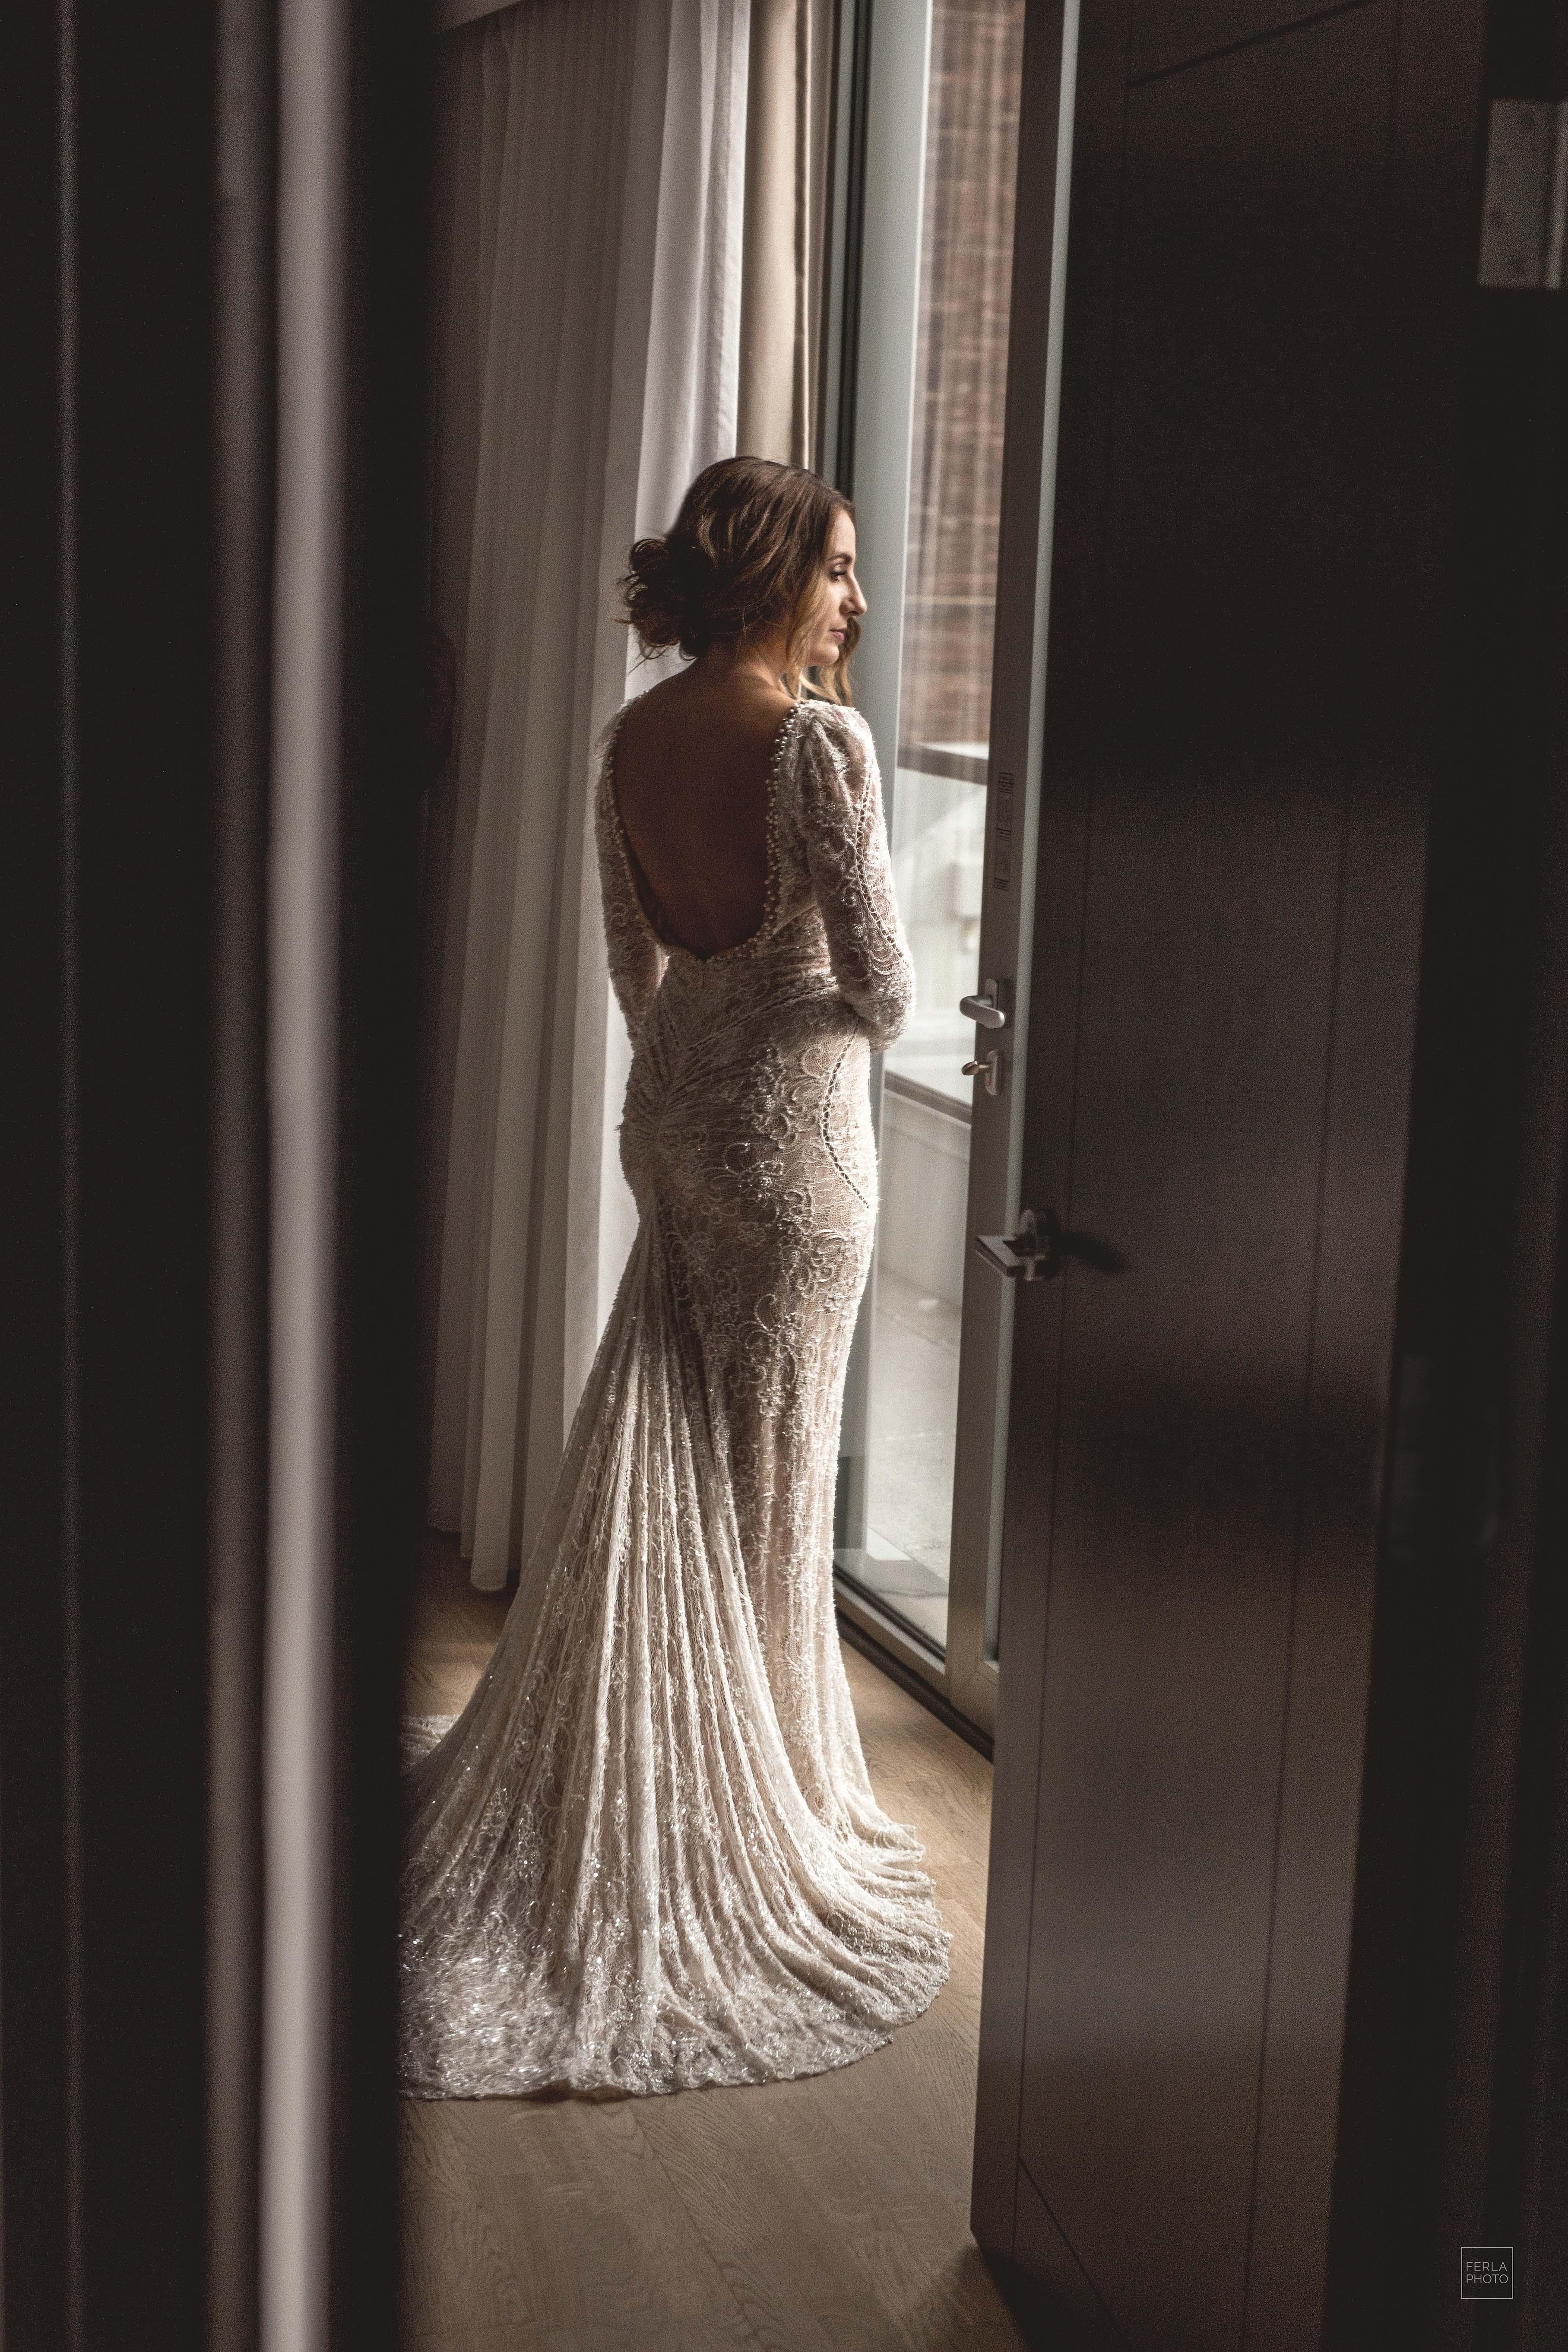 Atelier Eva Blanca - maquillage et coiffure de mariage   Montreal bridal makeup & hair